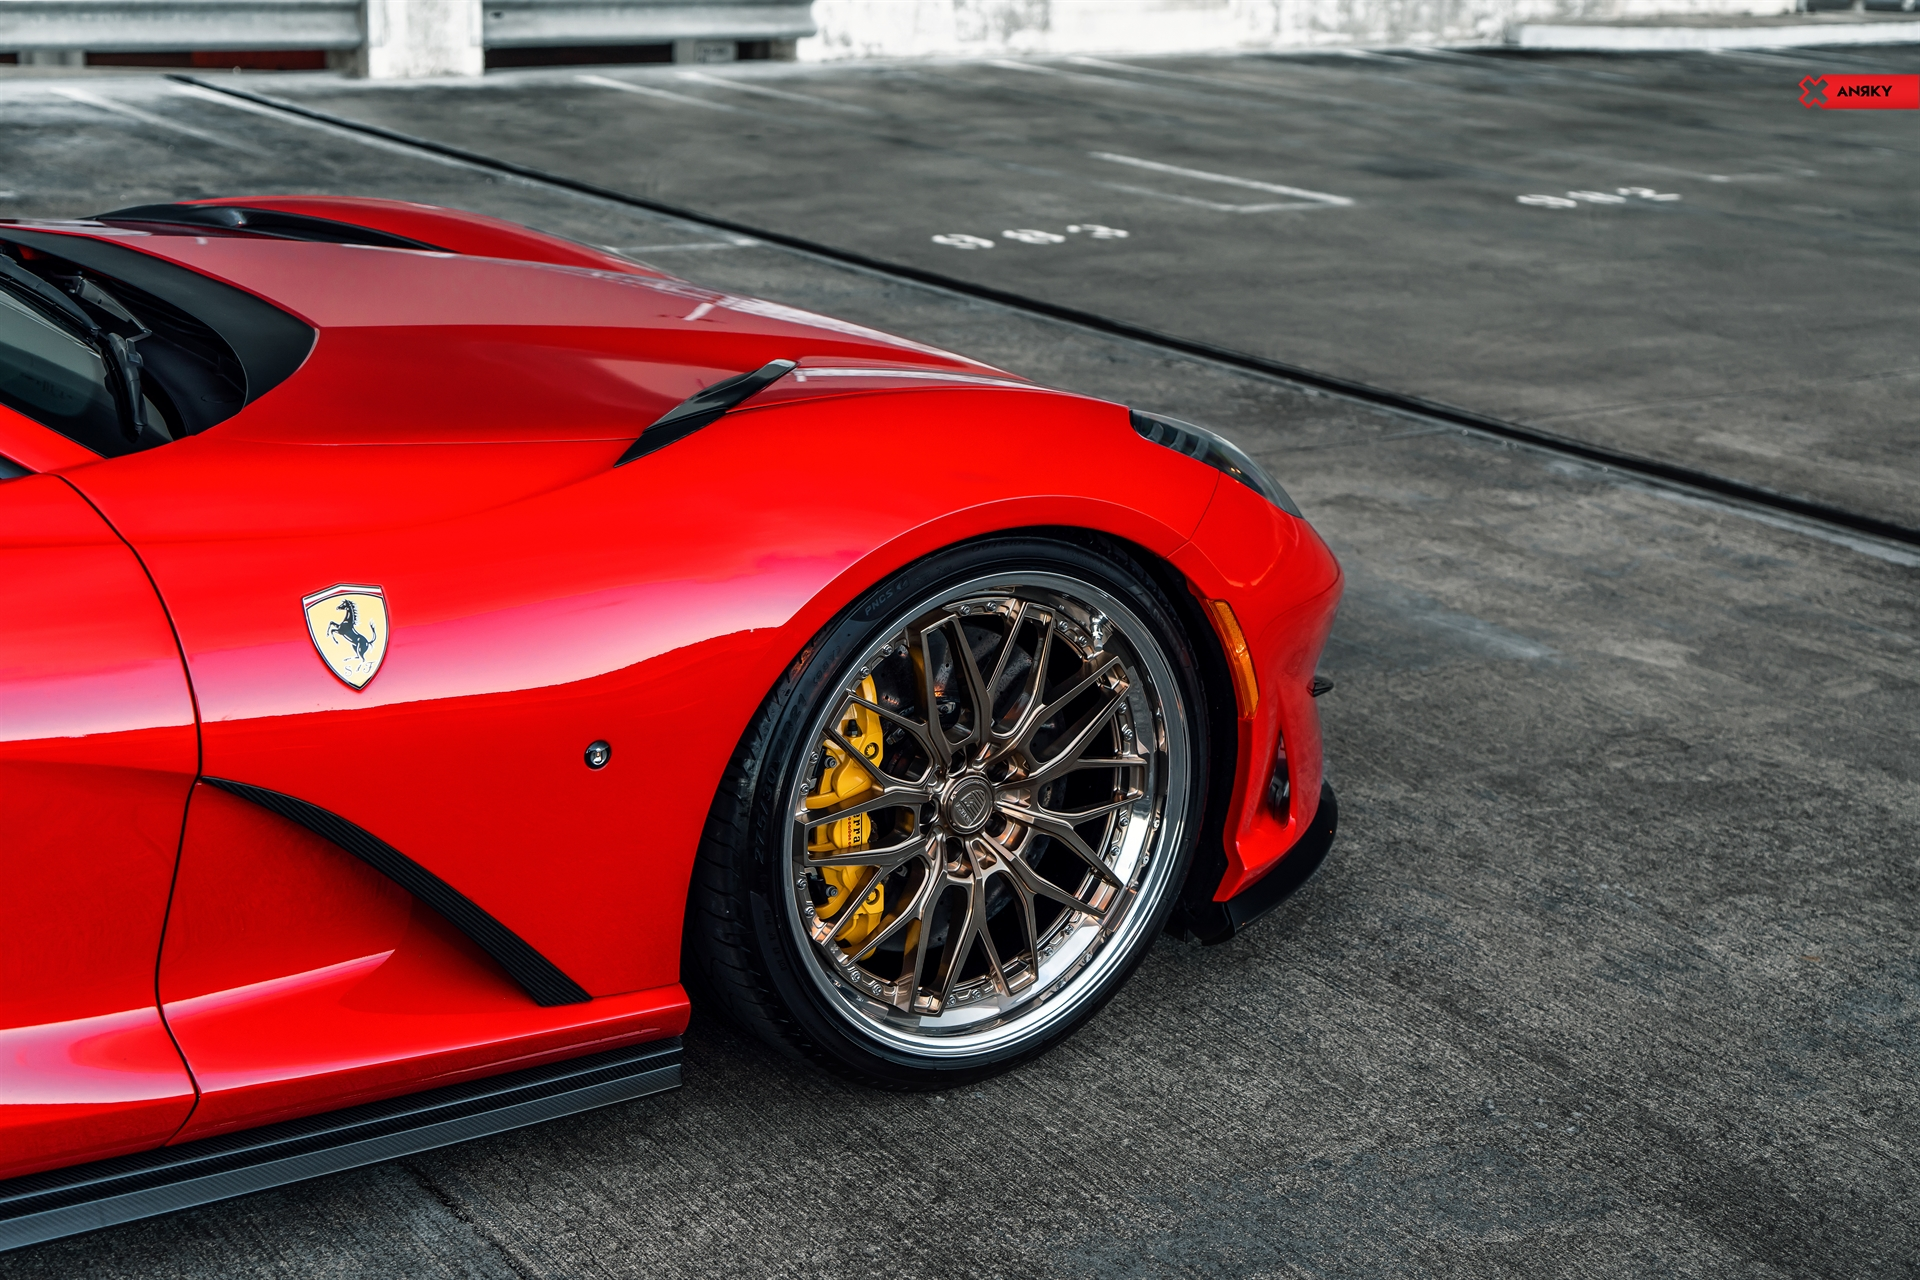 Ferrari 812 Superfast Retroseries Rs1 Anrky Wheels